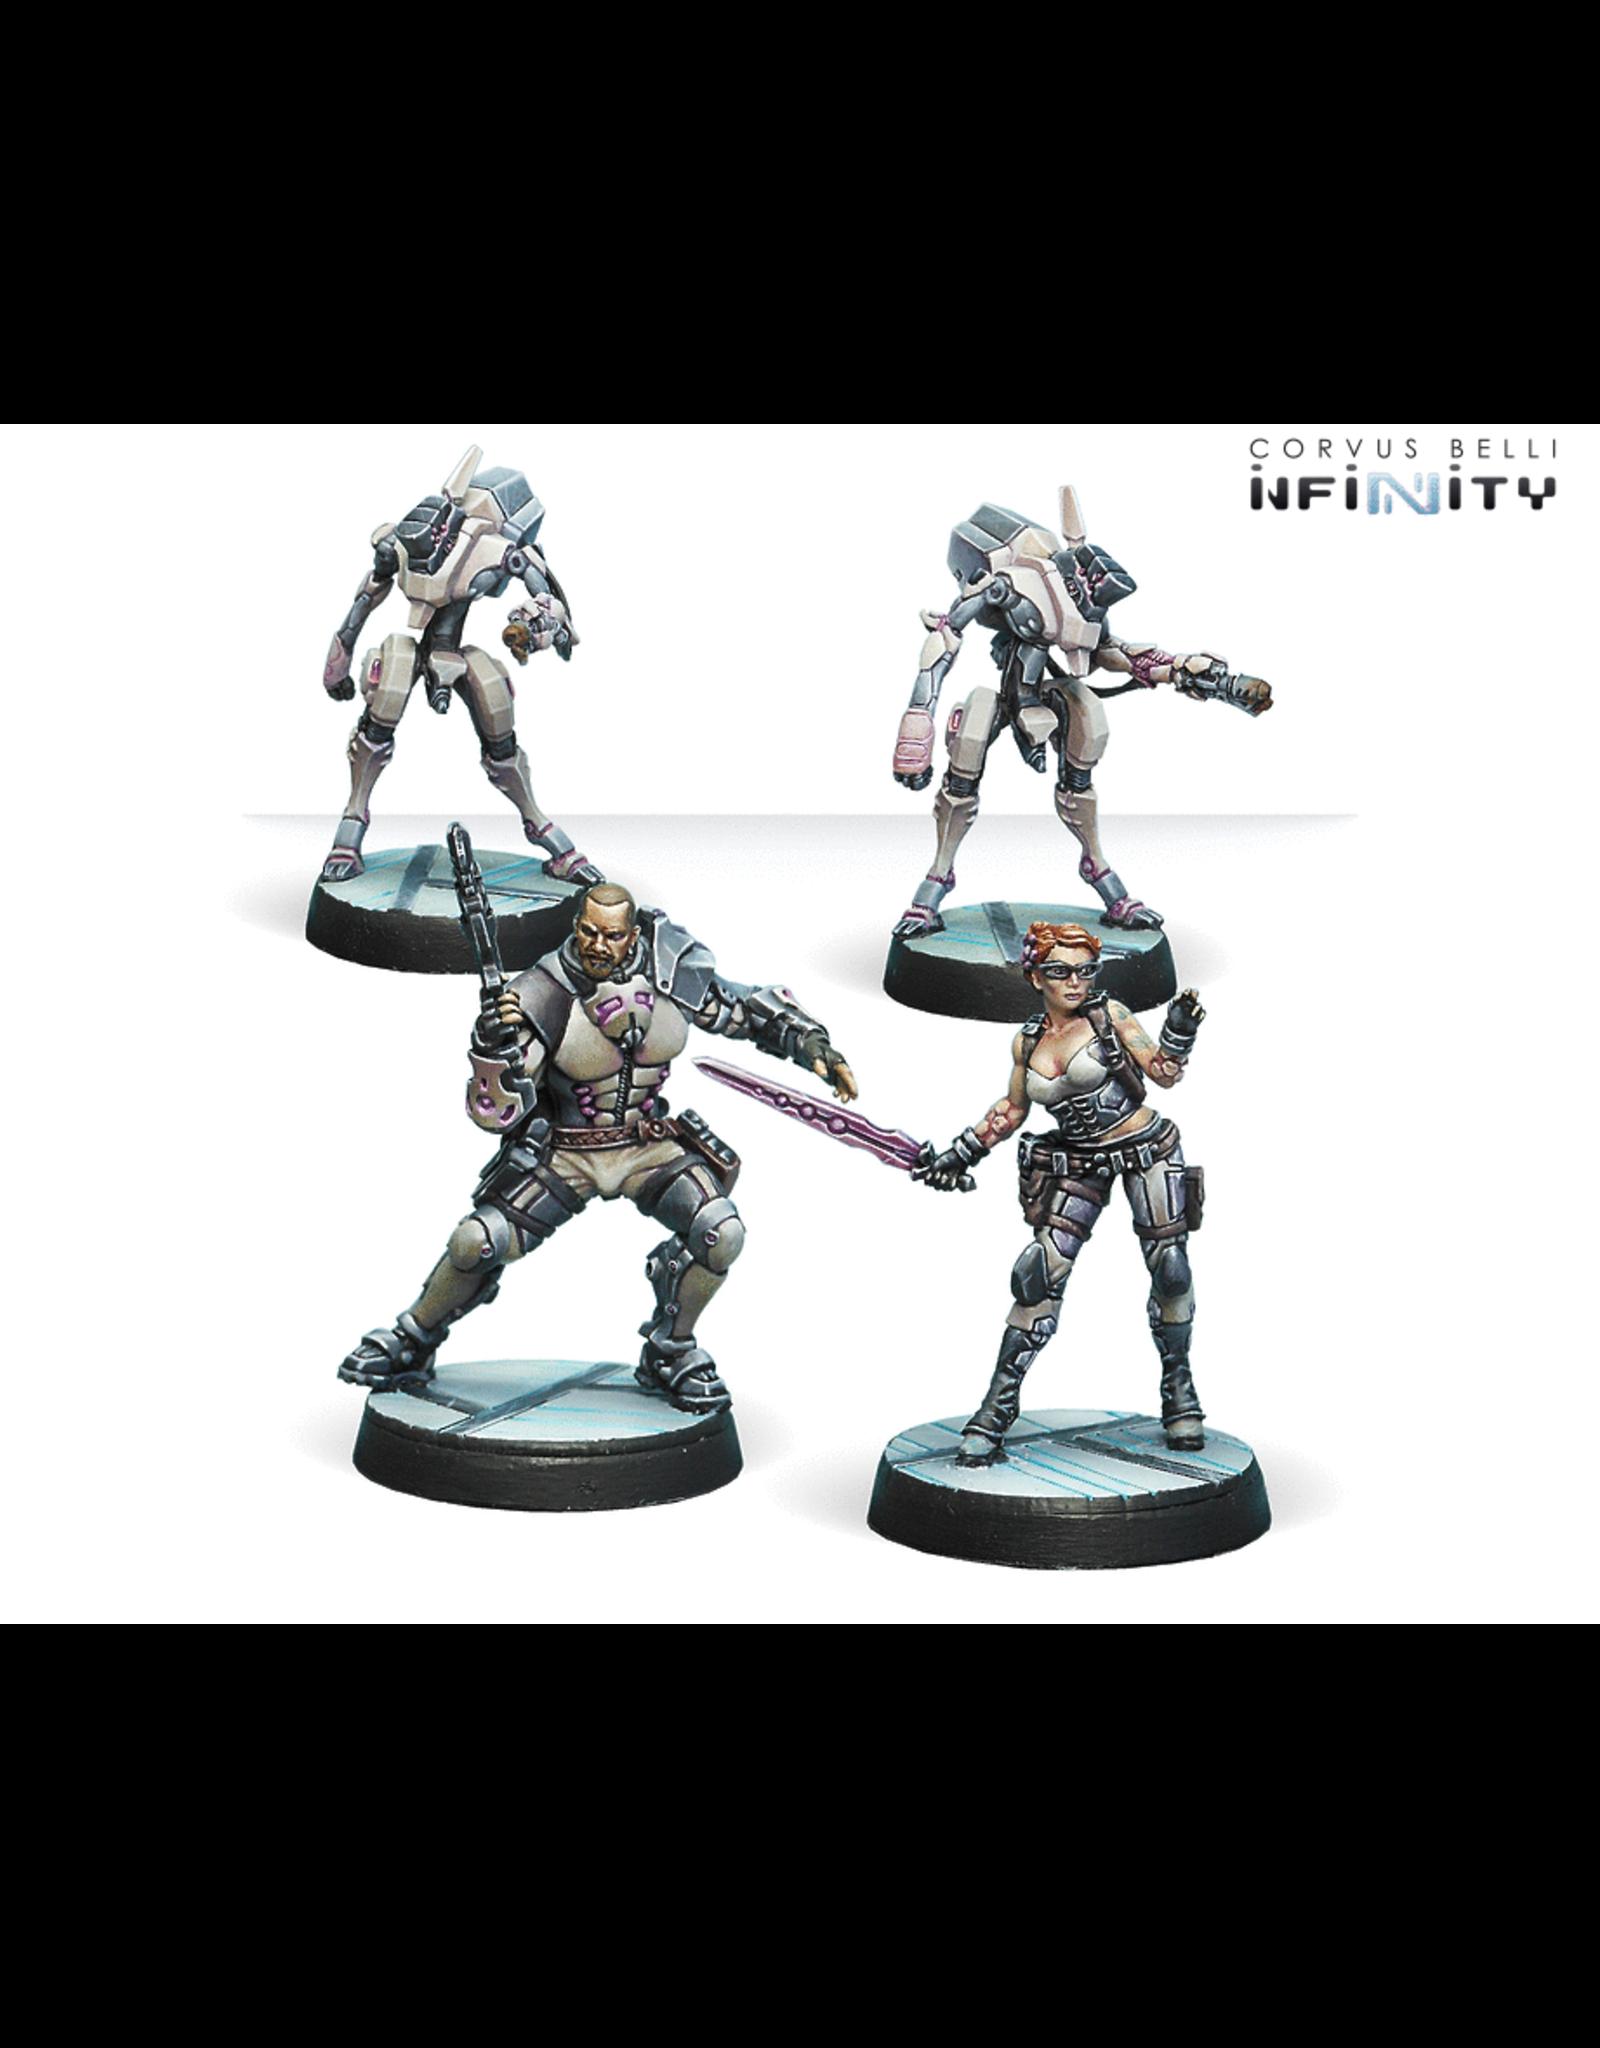 Corvus Belli Infinity: Drakios and Scylla, Steel Phalanx's NCO